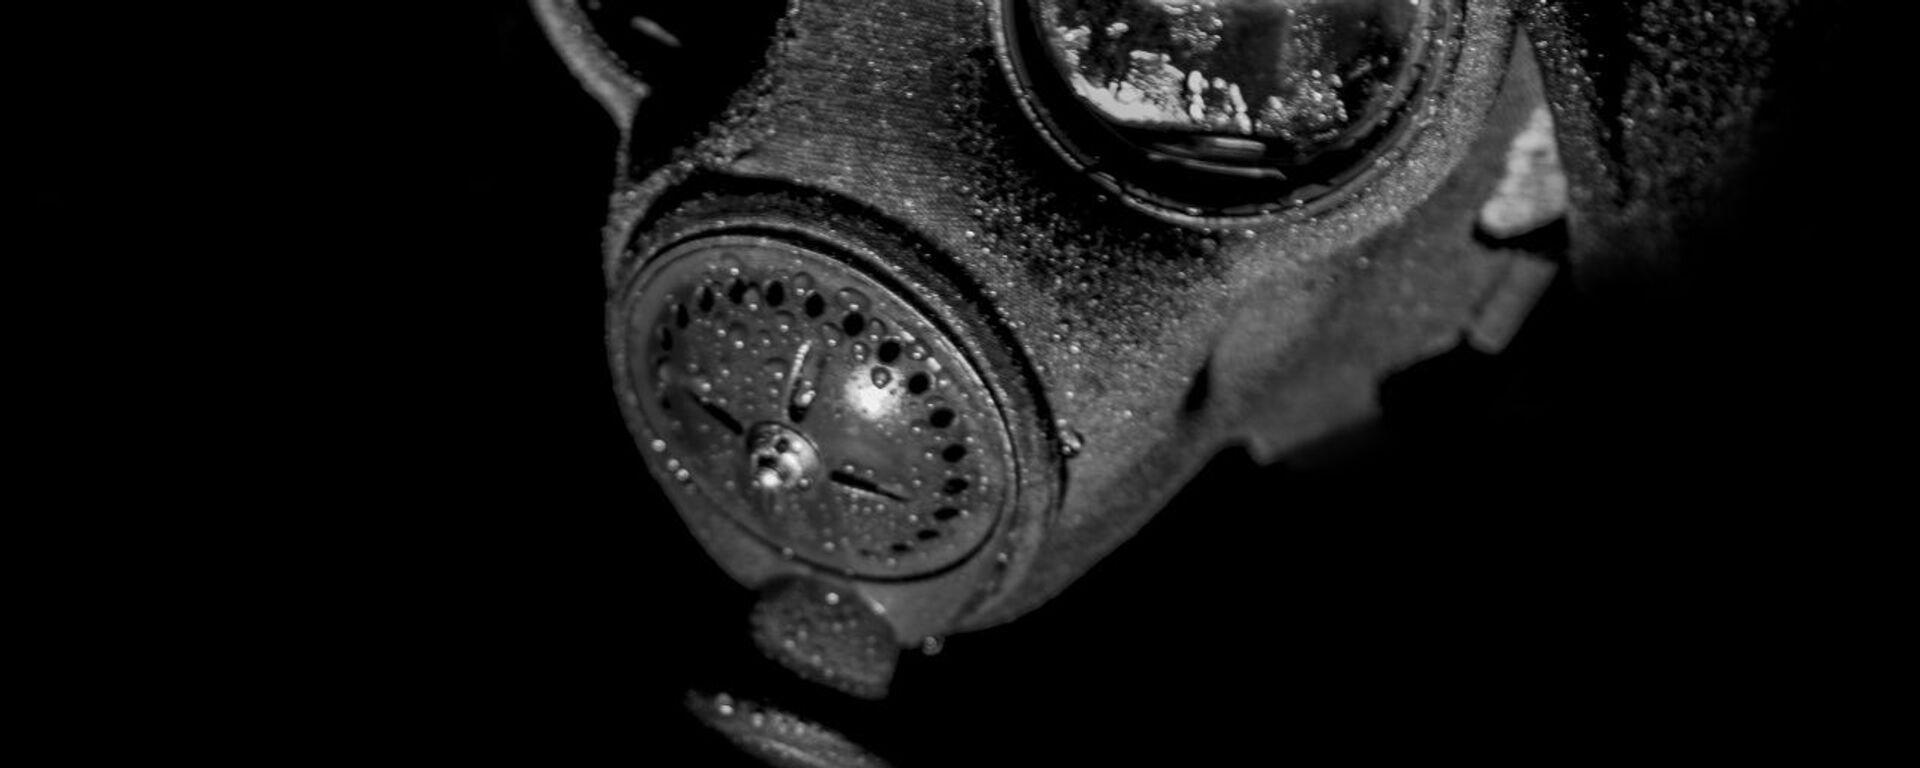 Gas mask  - Sputnik International, 1920, 20.08.2021